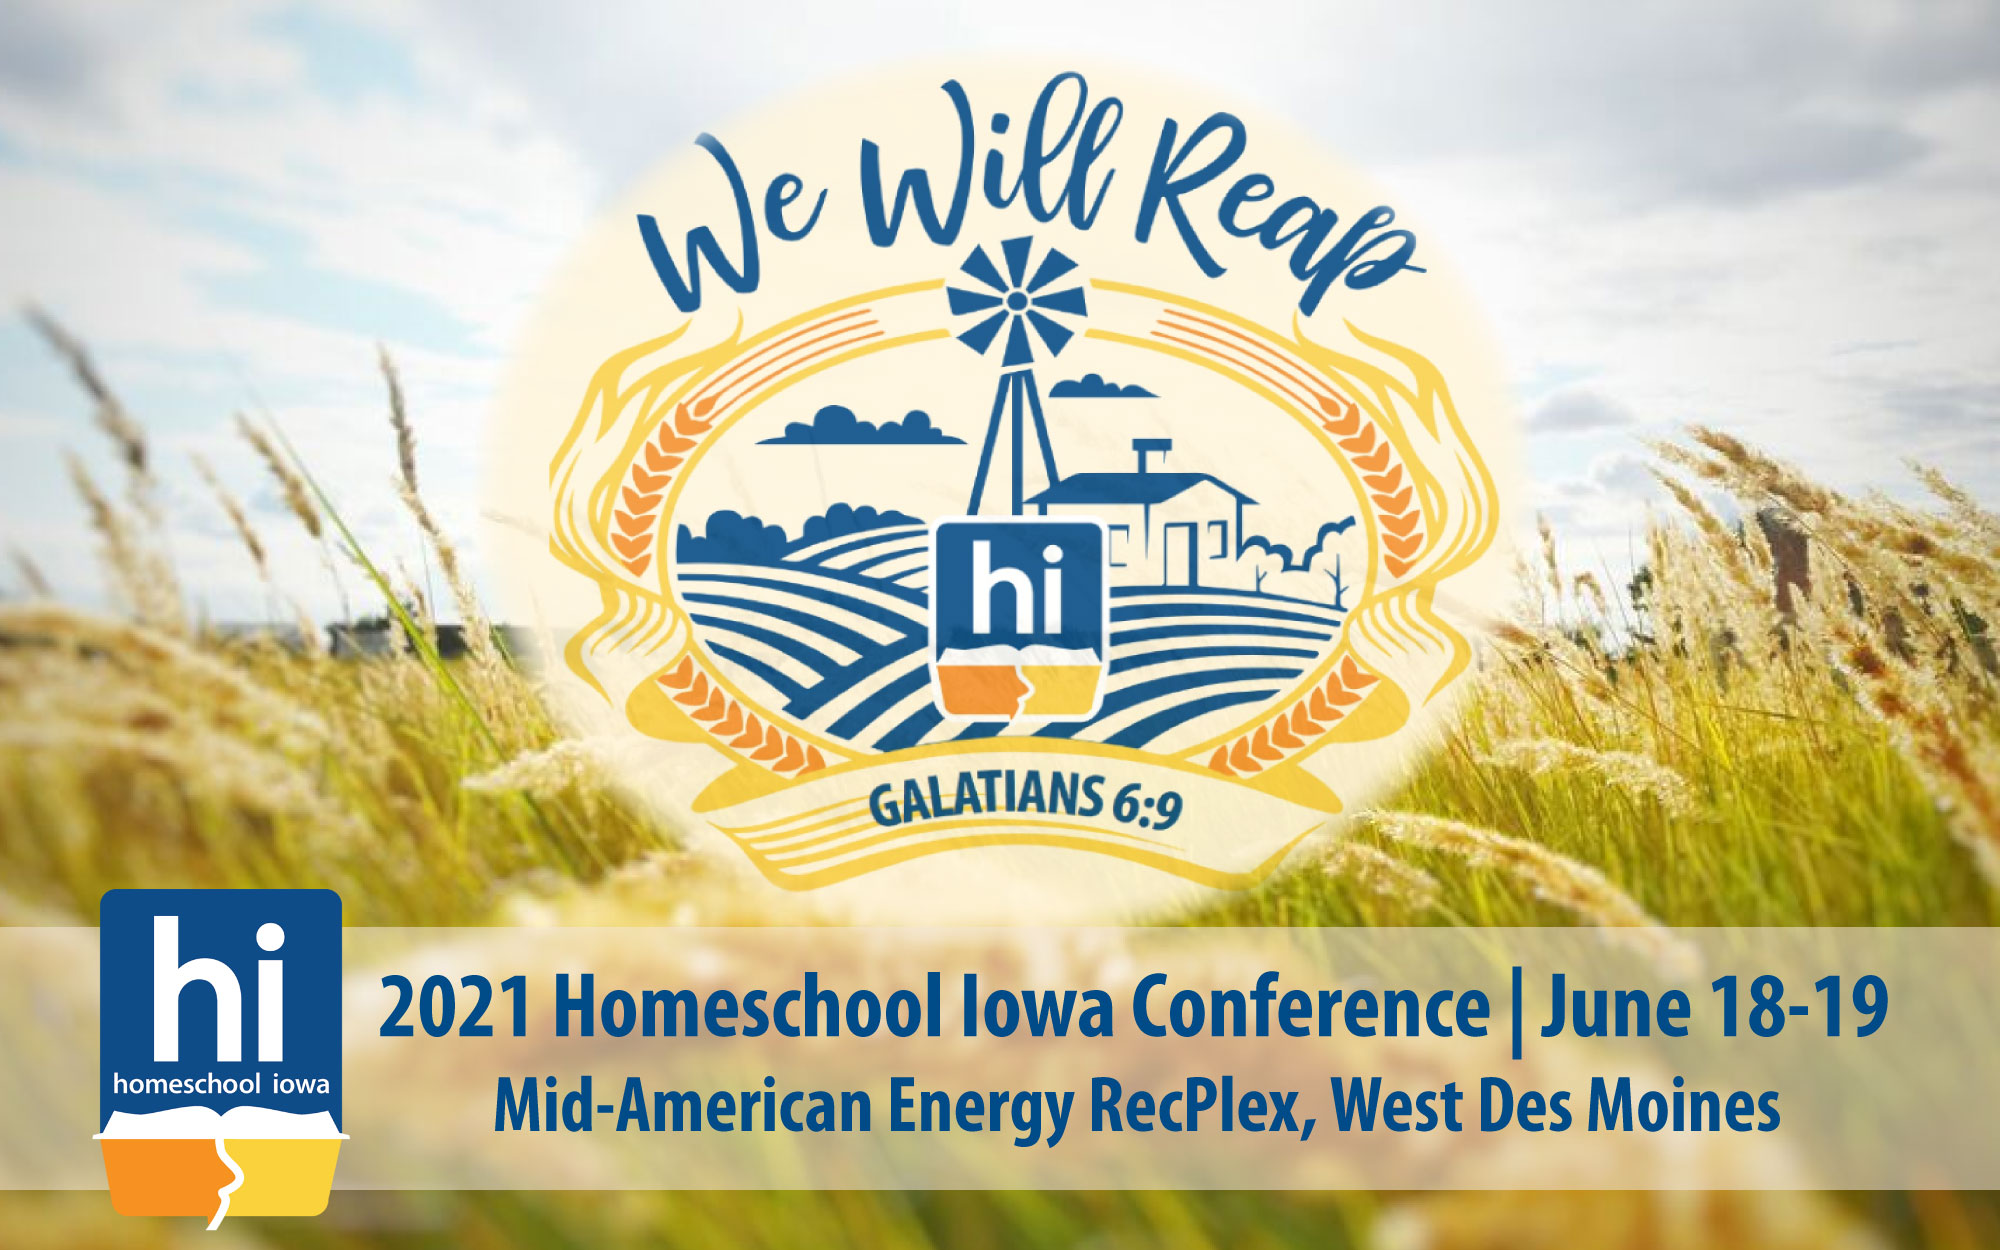 2021 Homeschool Iowa Conference